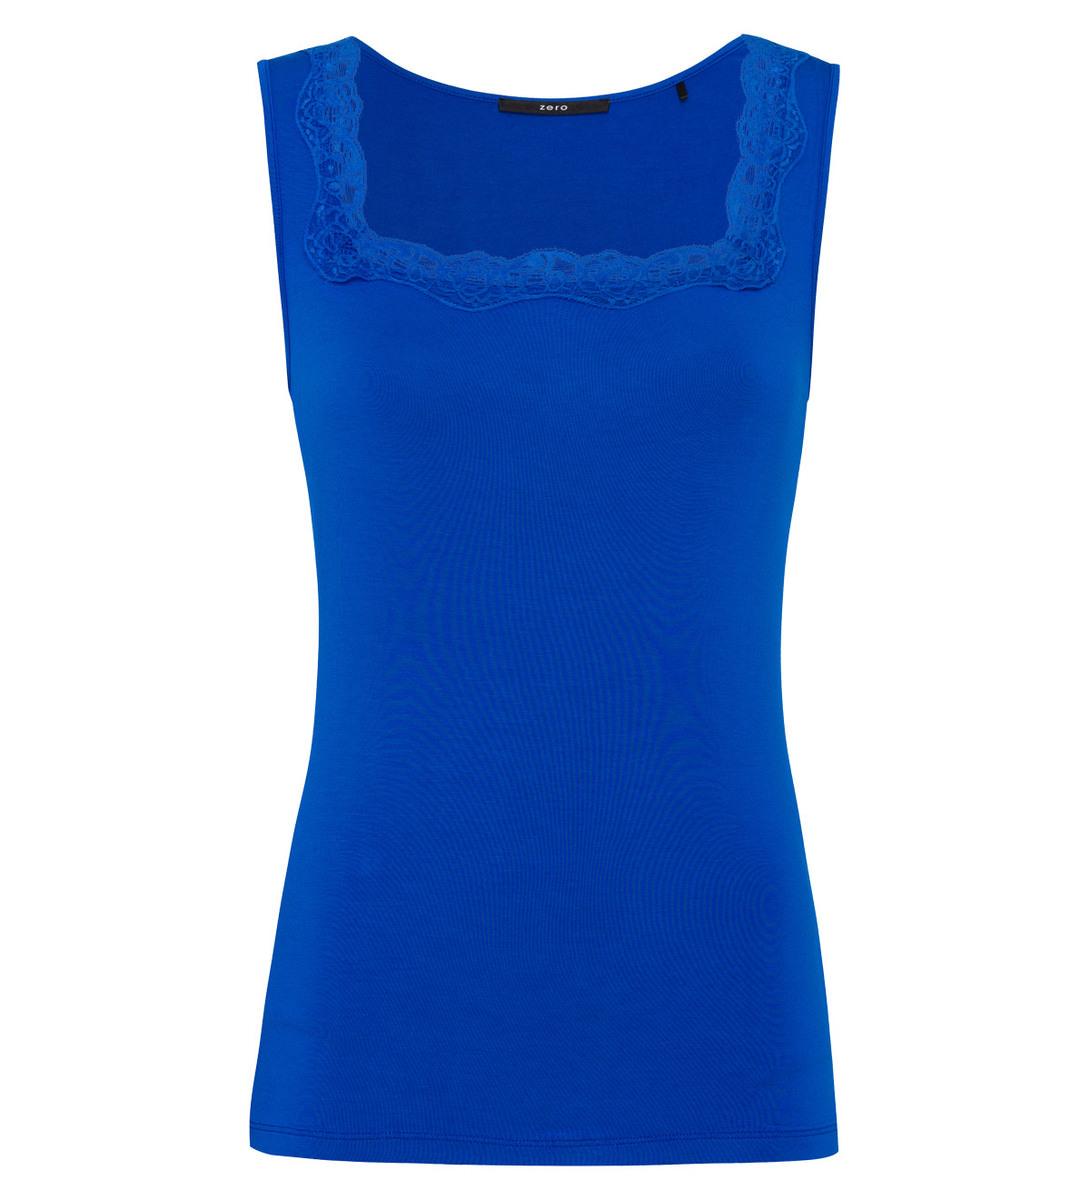 Top mit Spitze in cobalt blue